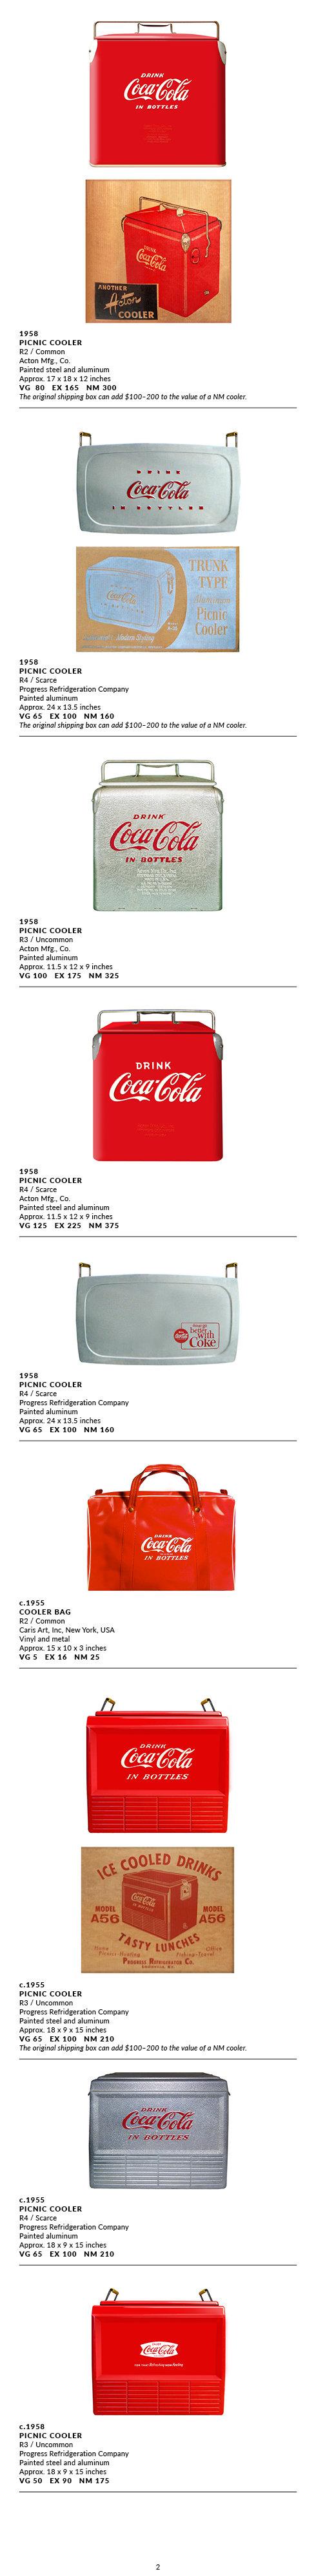 Picnic Coolers2.jpg